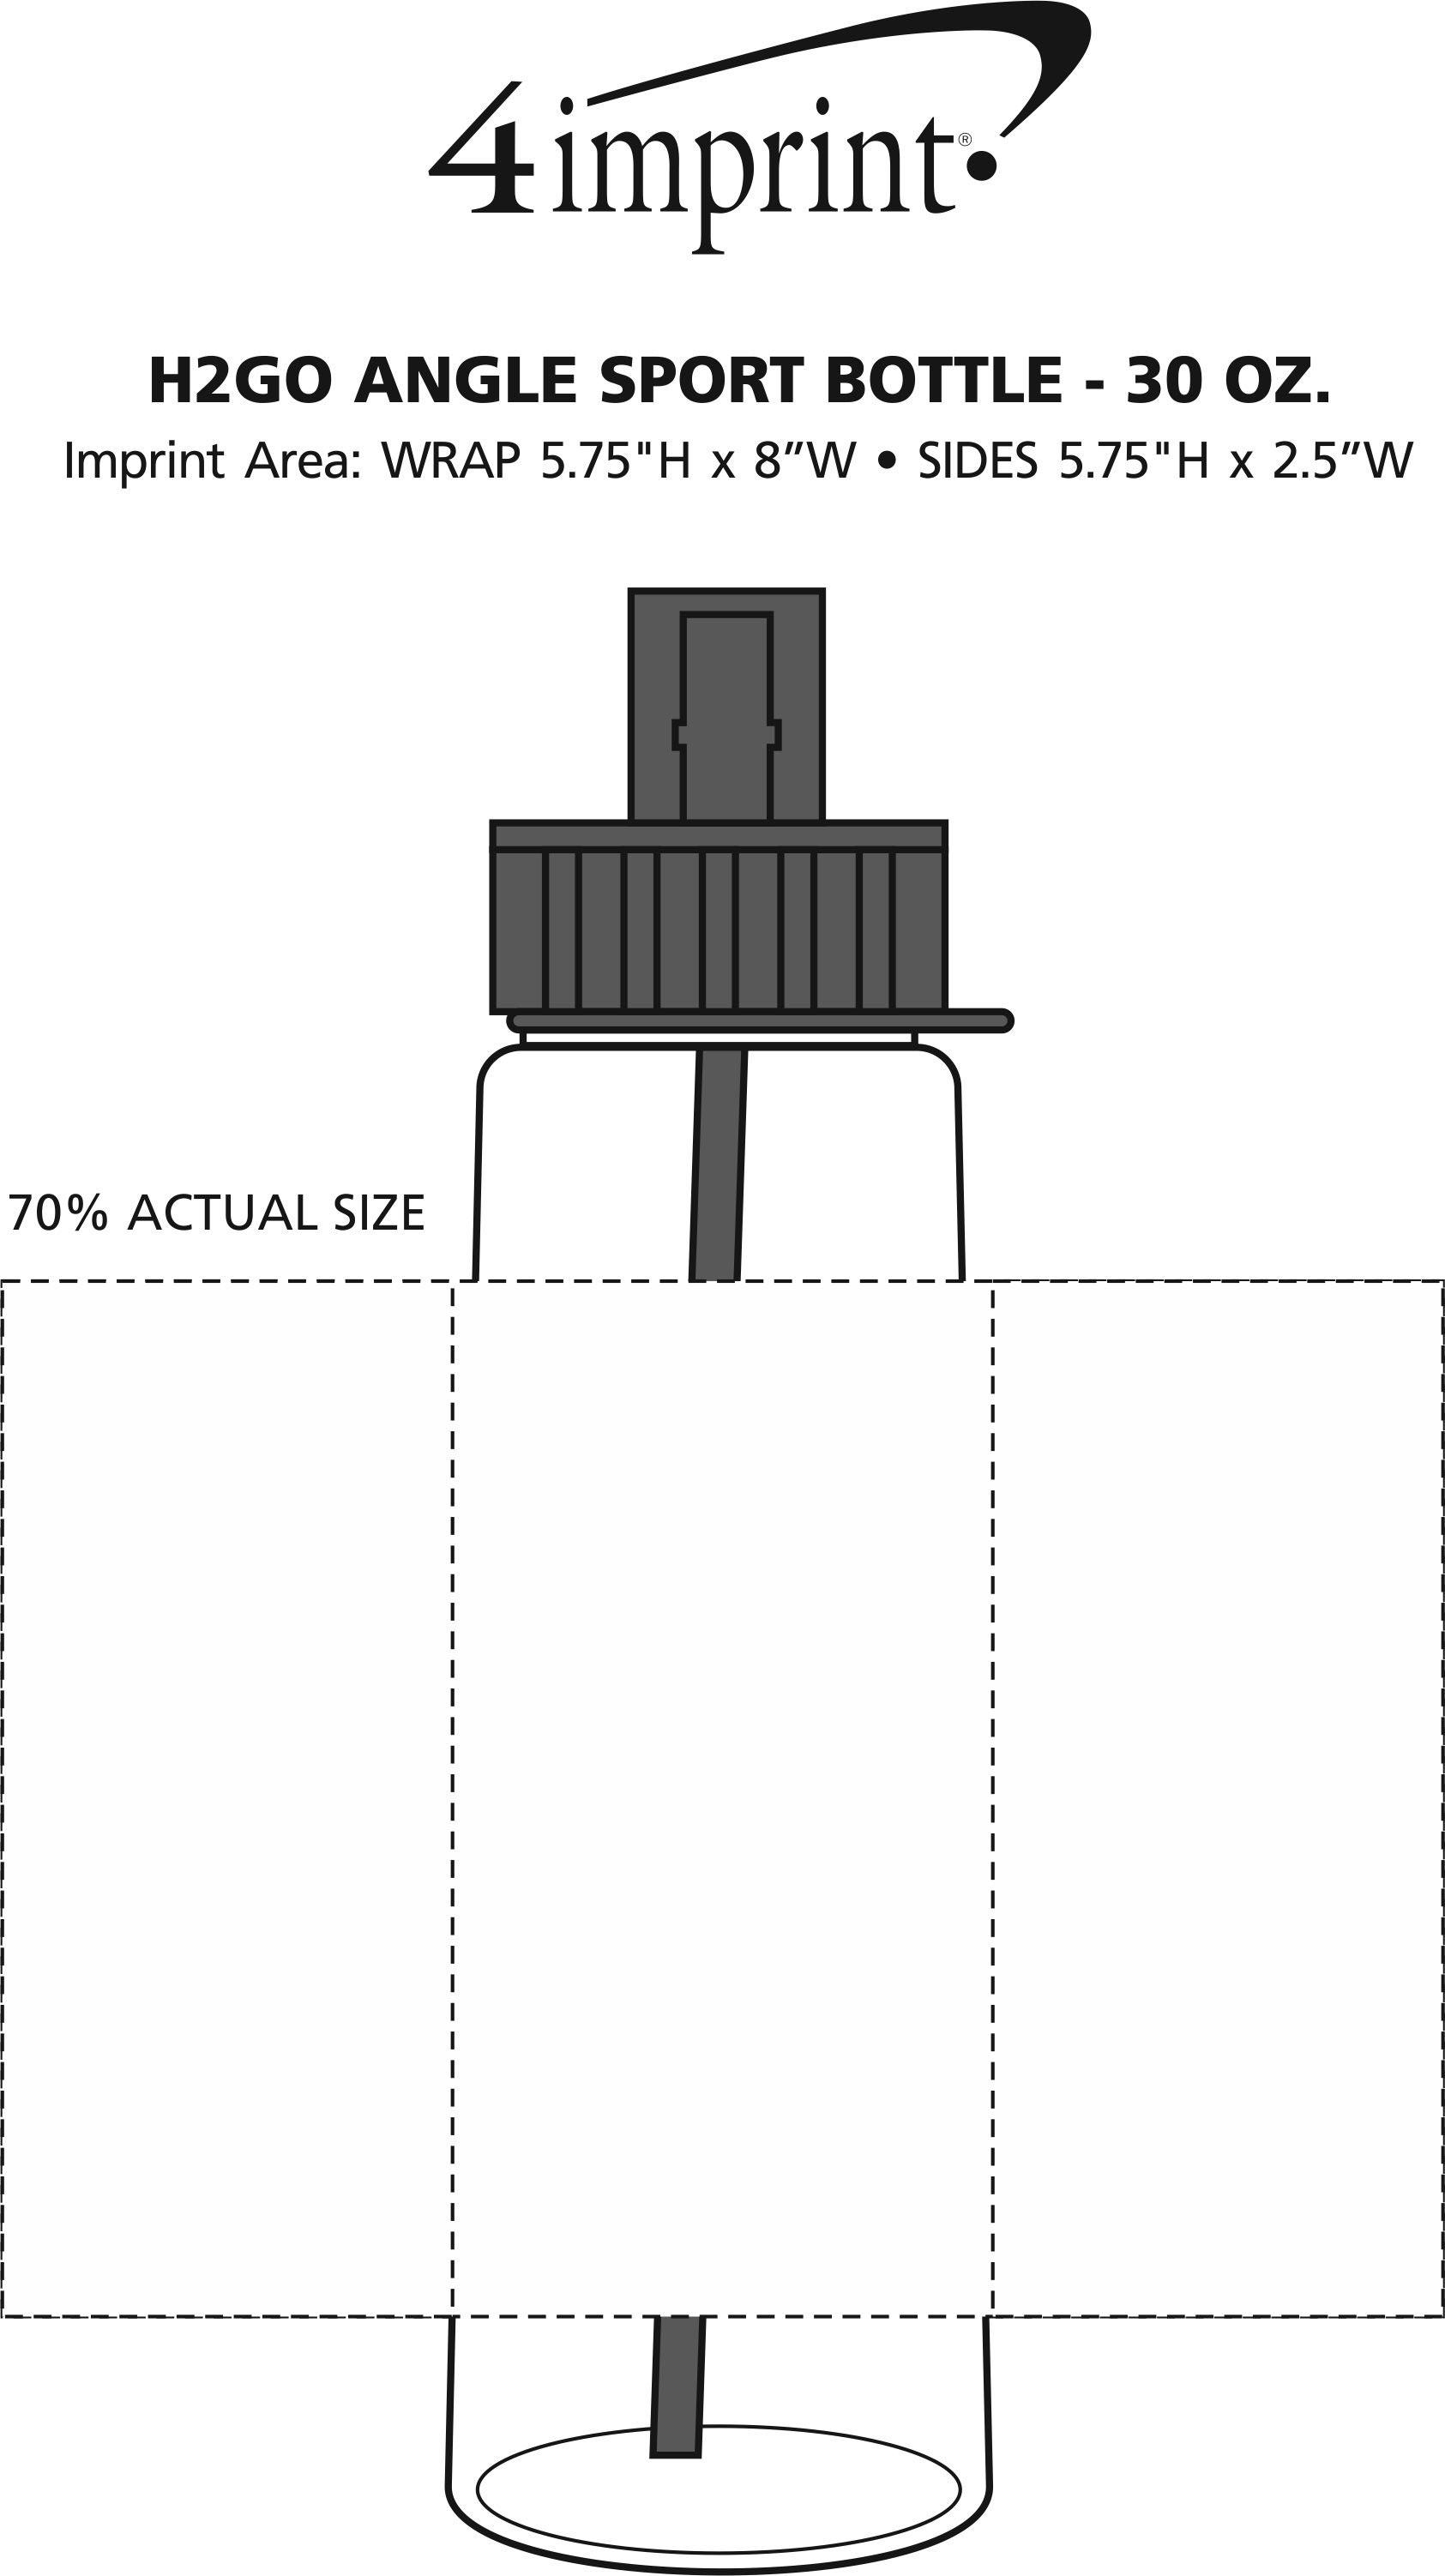 Imprint Area of h2go Angle Sport Bottle - 30 oz.